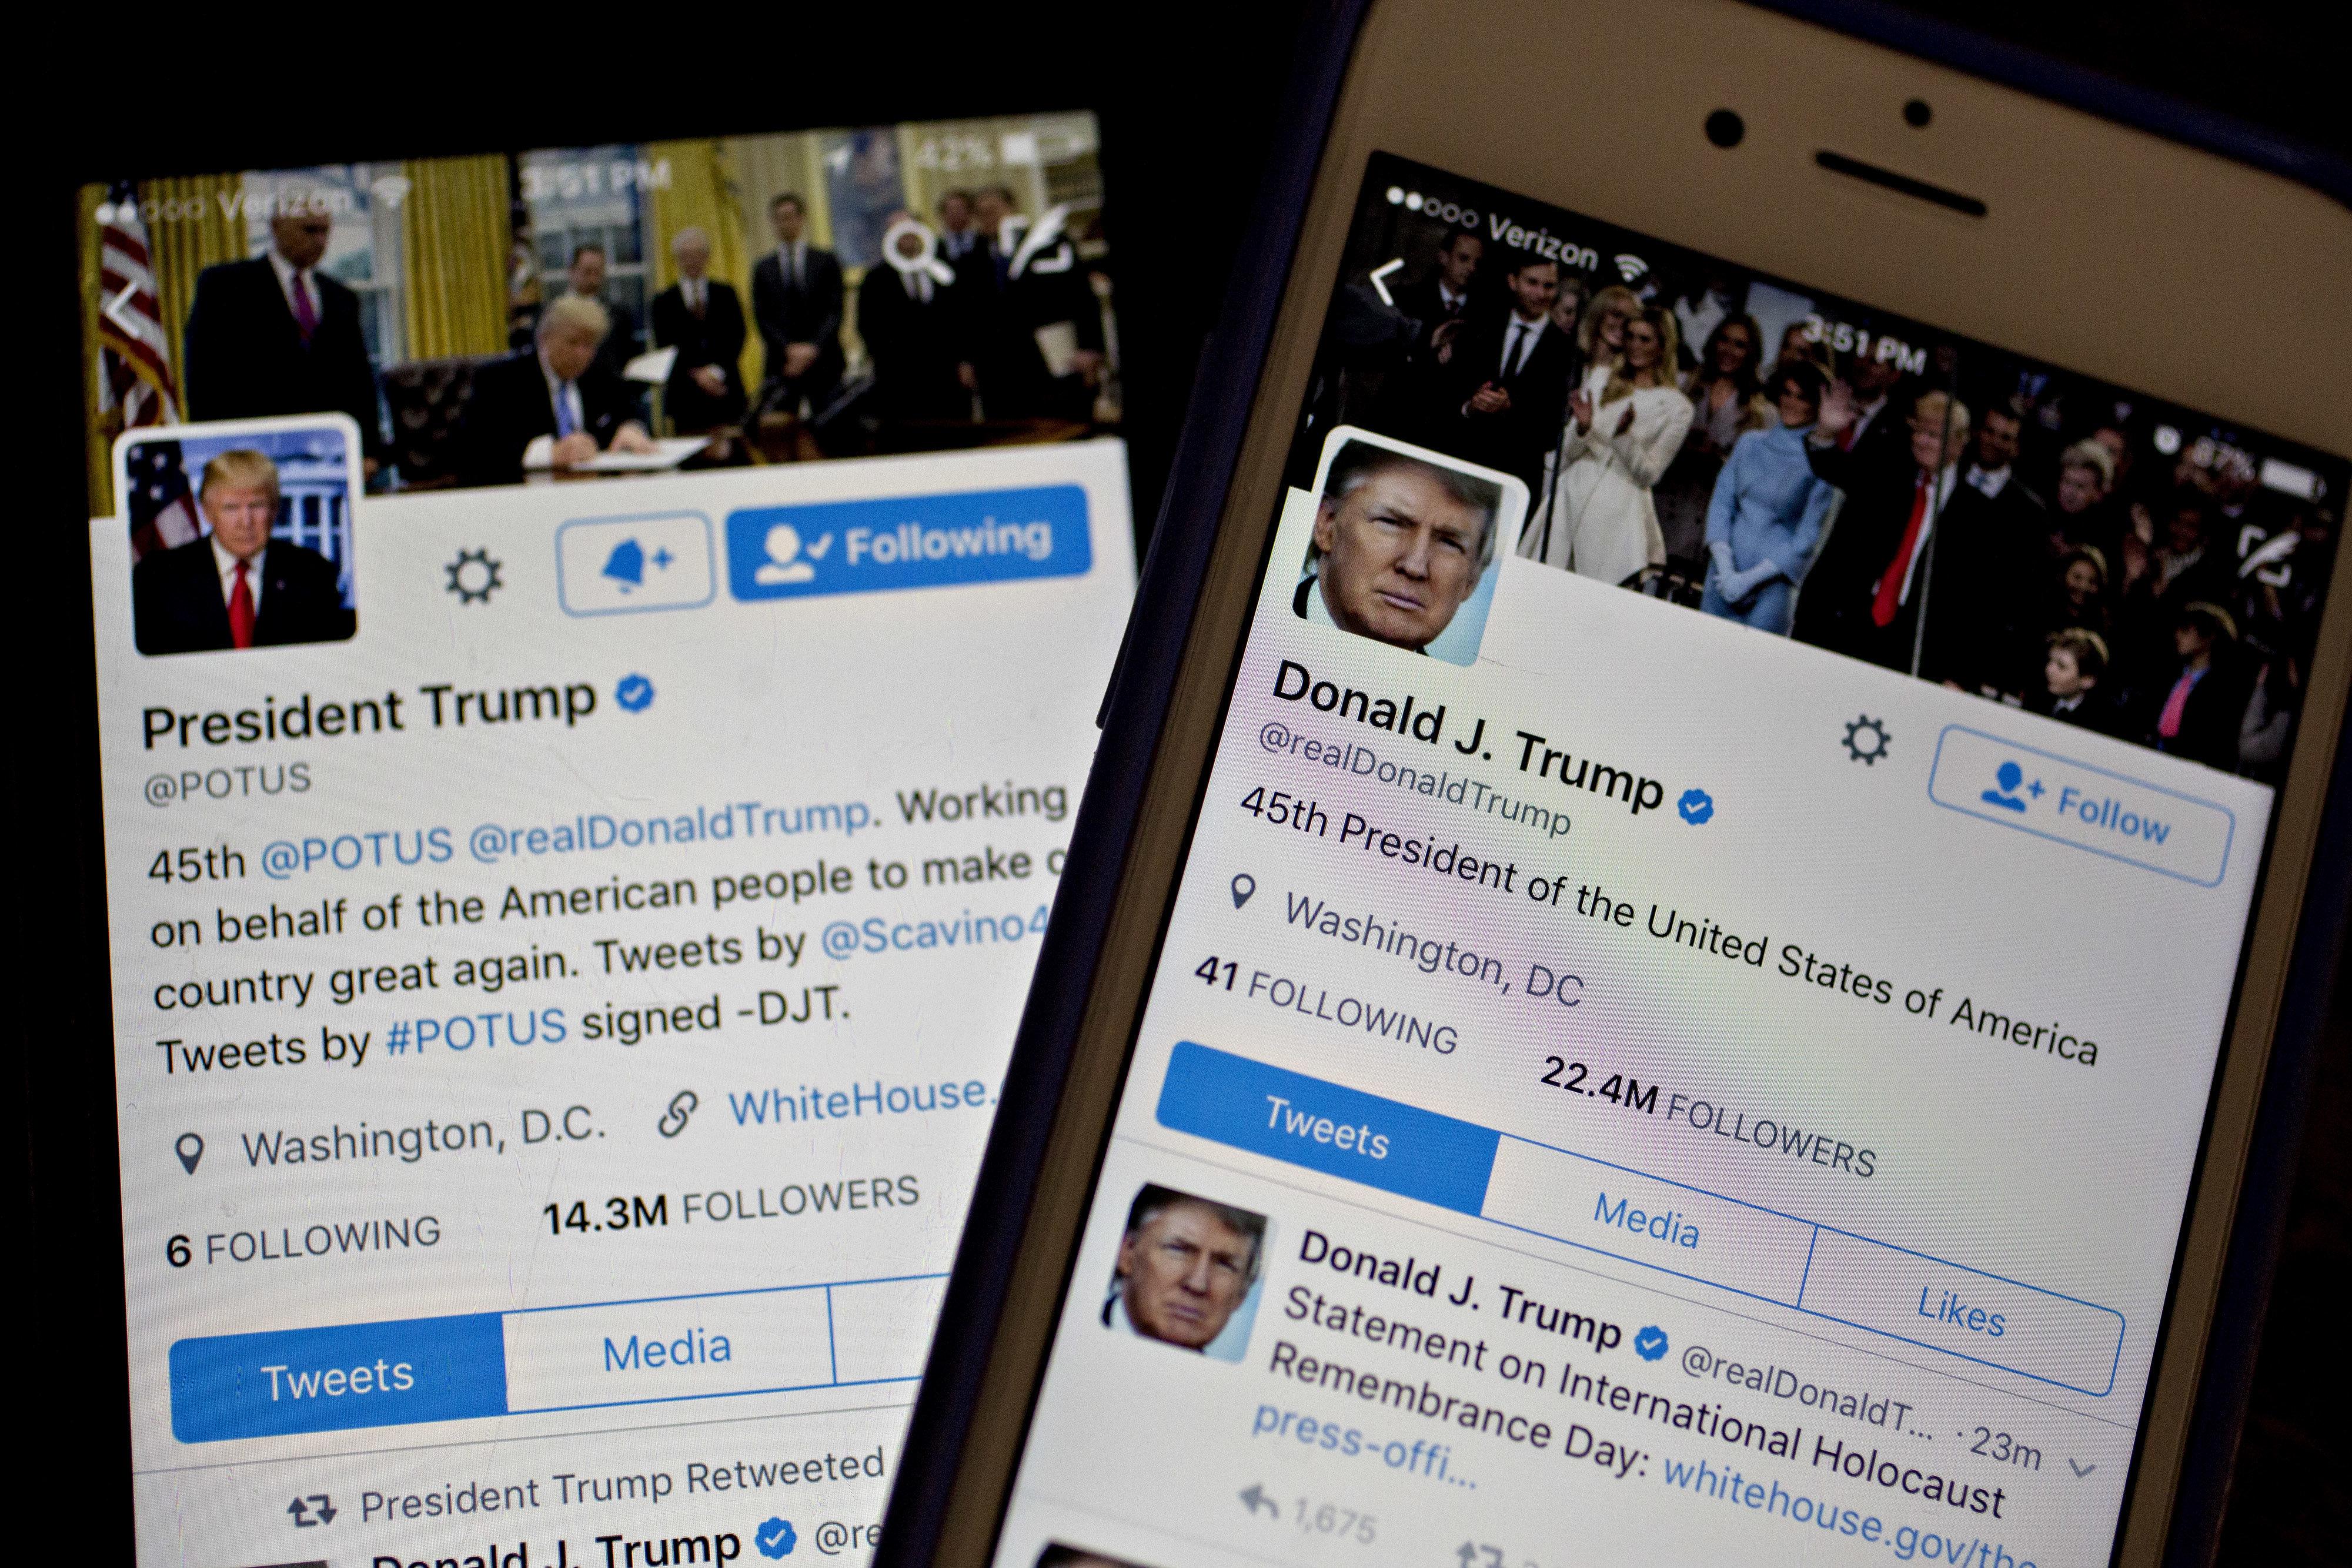 The Twitters of U.S. President Donald Trump, @POTUS and @realDoanldTrump, seen Friday, Jan. 27, 2017.